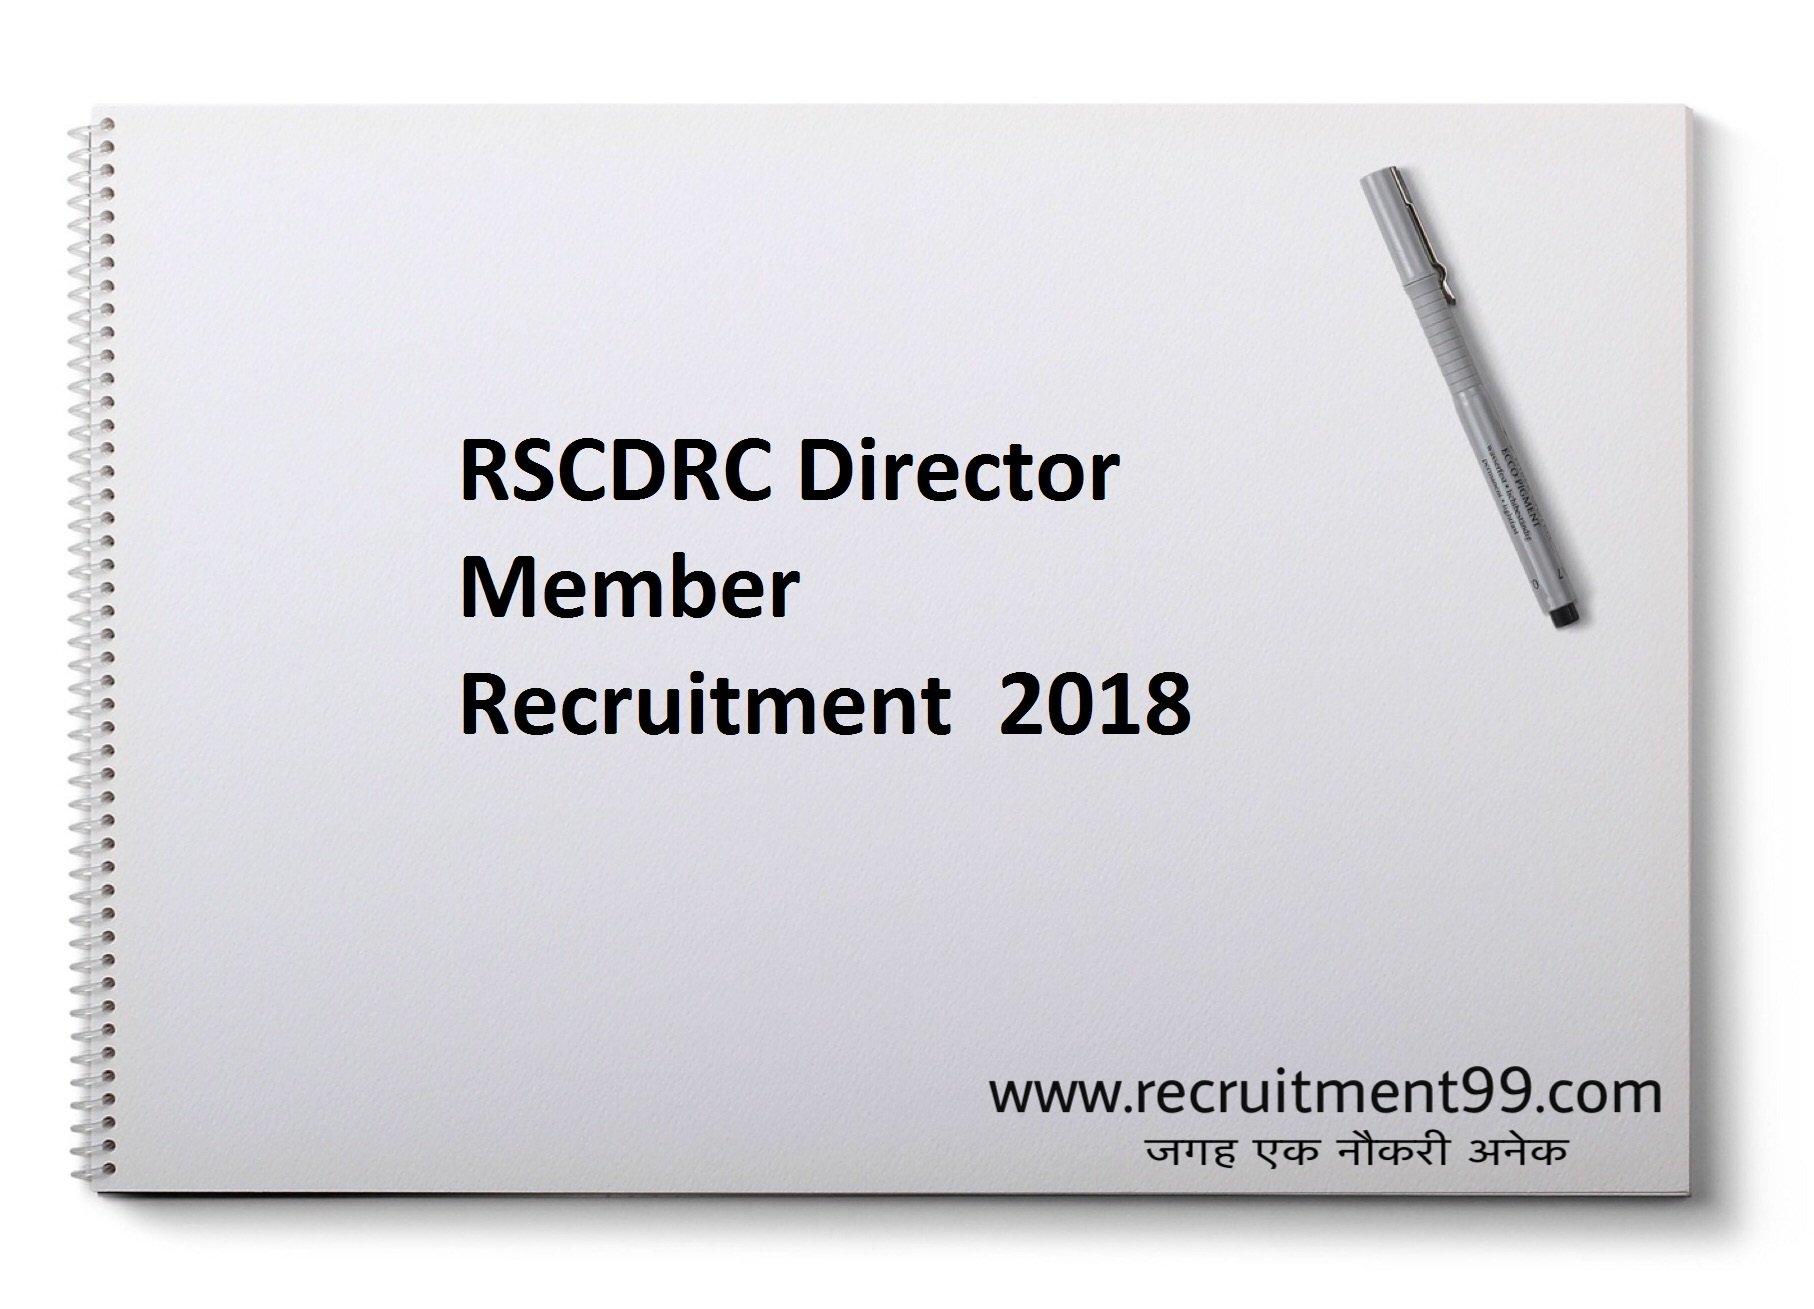 RSCDRC Director Member Recruitment Admit Card Result 2018